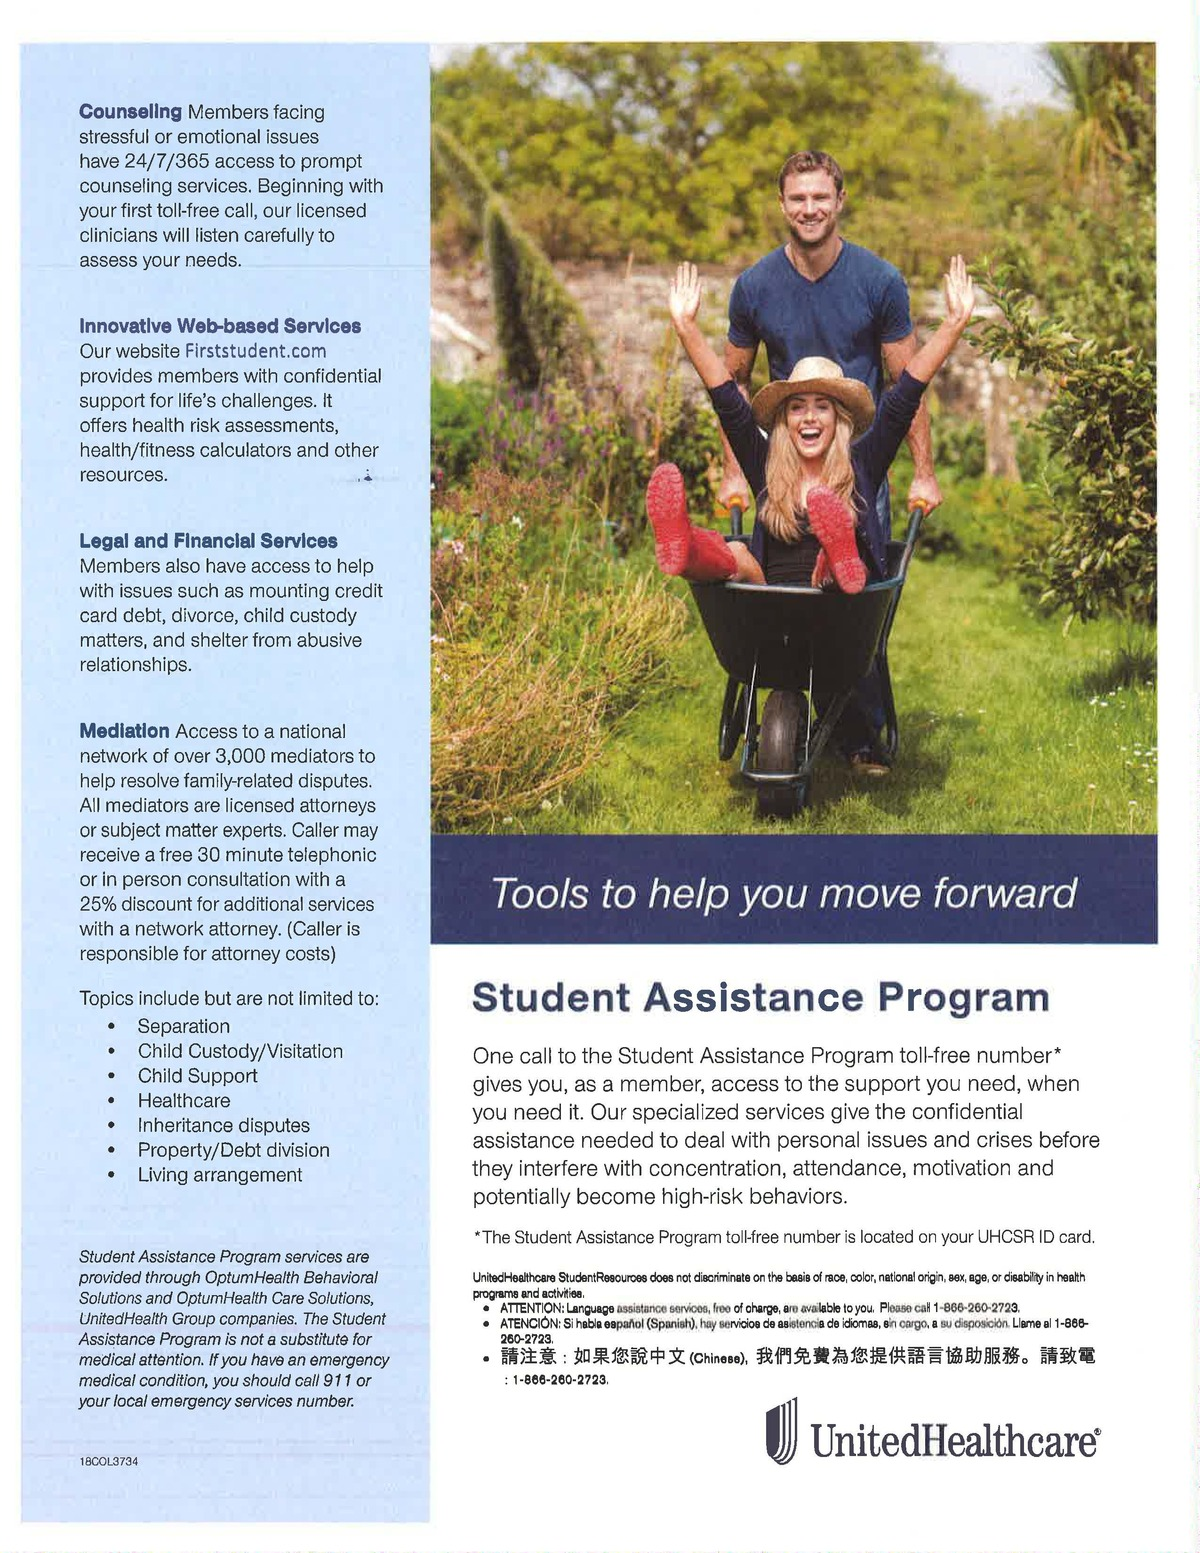 Student Assistance Program Flyer